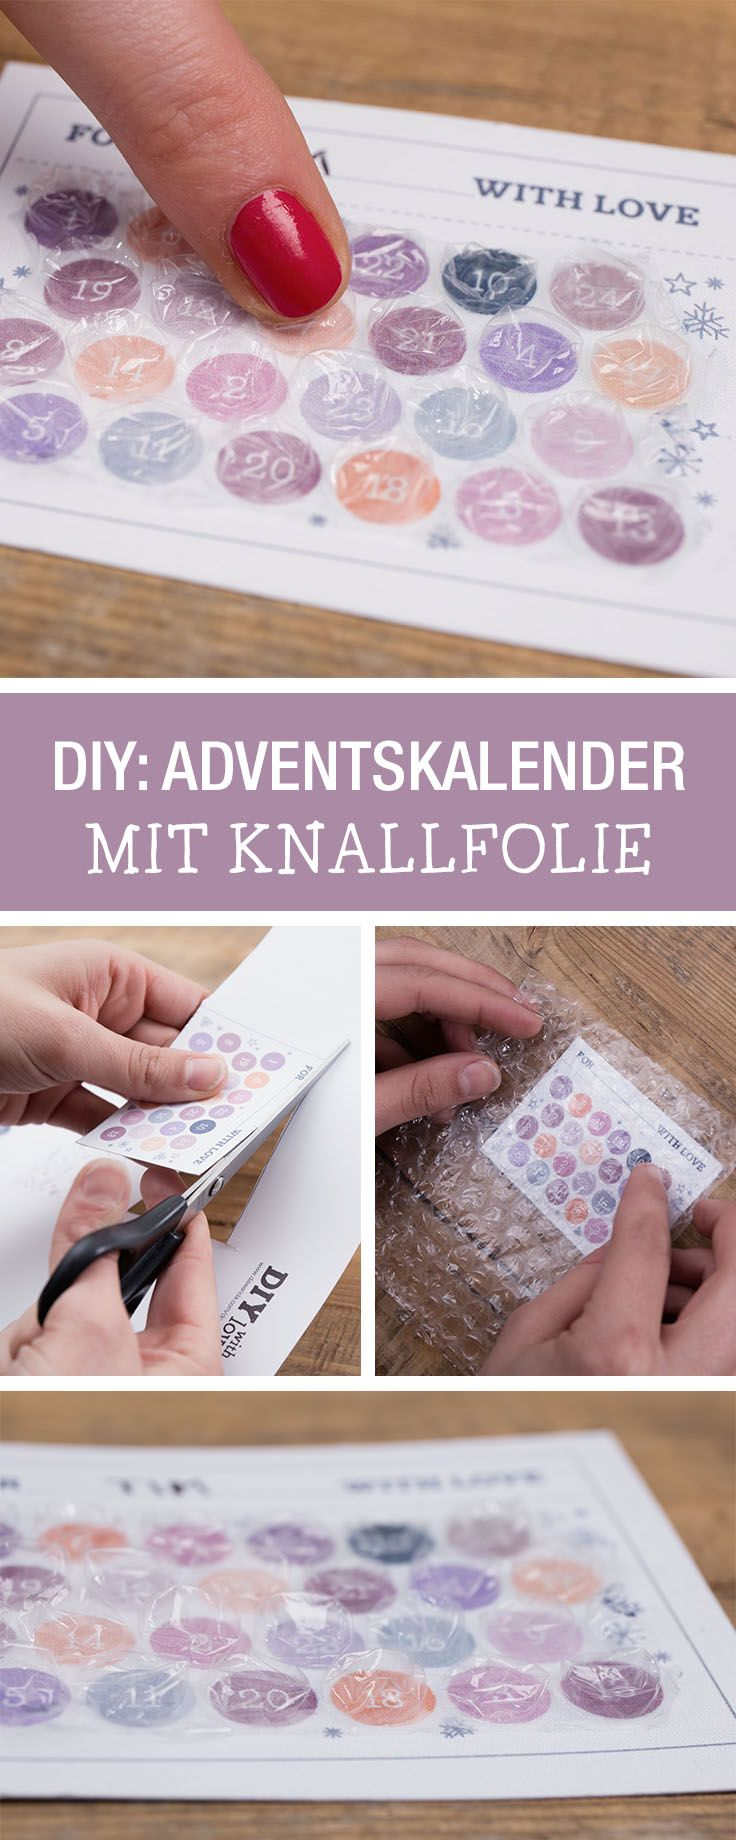 Witziger kleiner Adventskalender mit Knallfolie, kleine Geschenkidee / cute little advents calendar made with popping foil via DaWanda.com